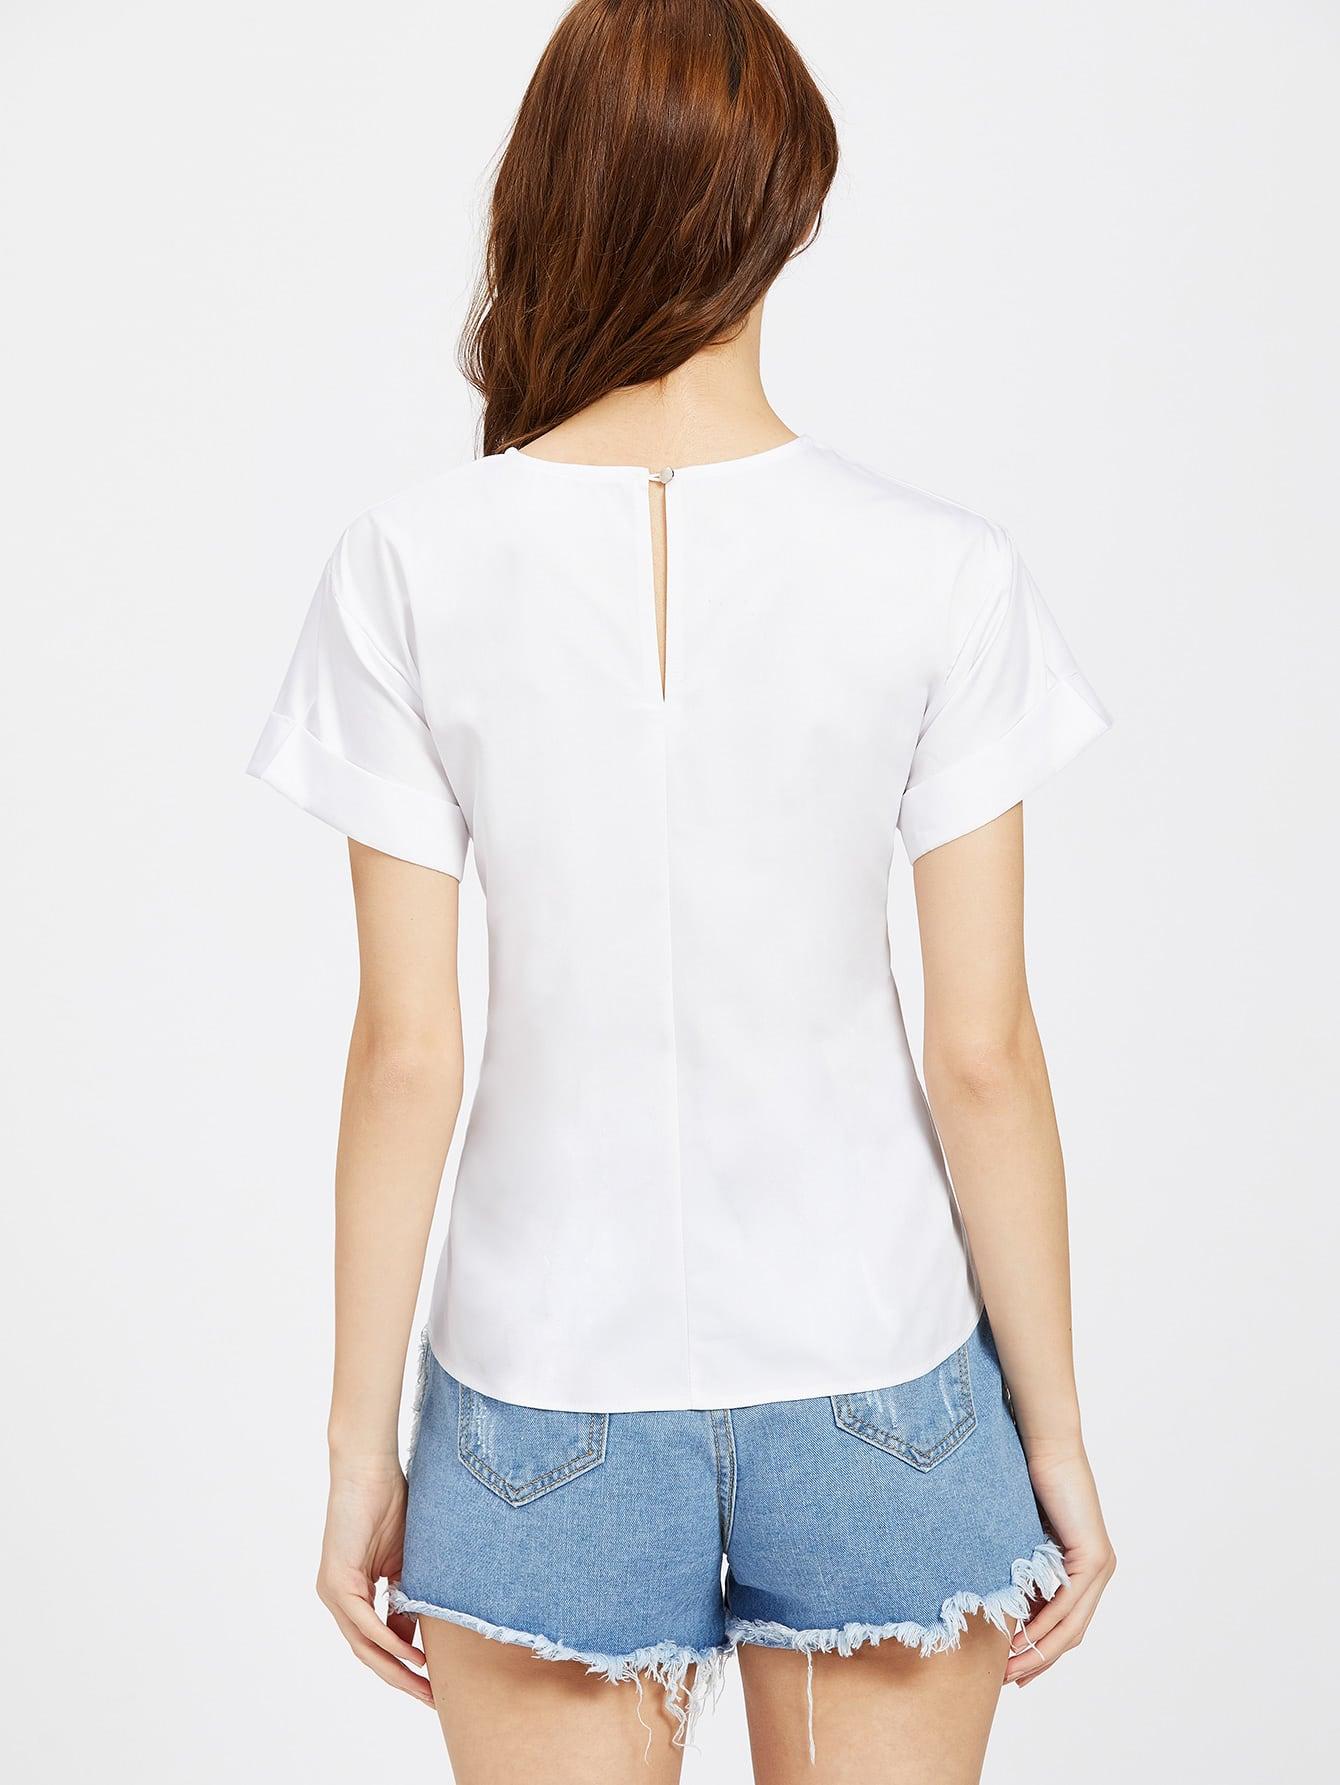 blouse170412003_2